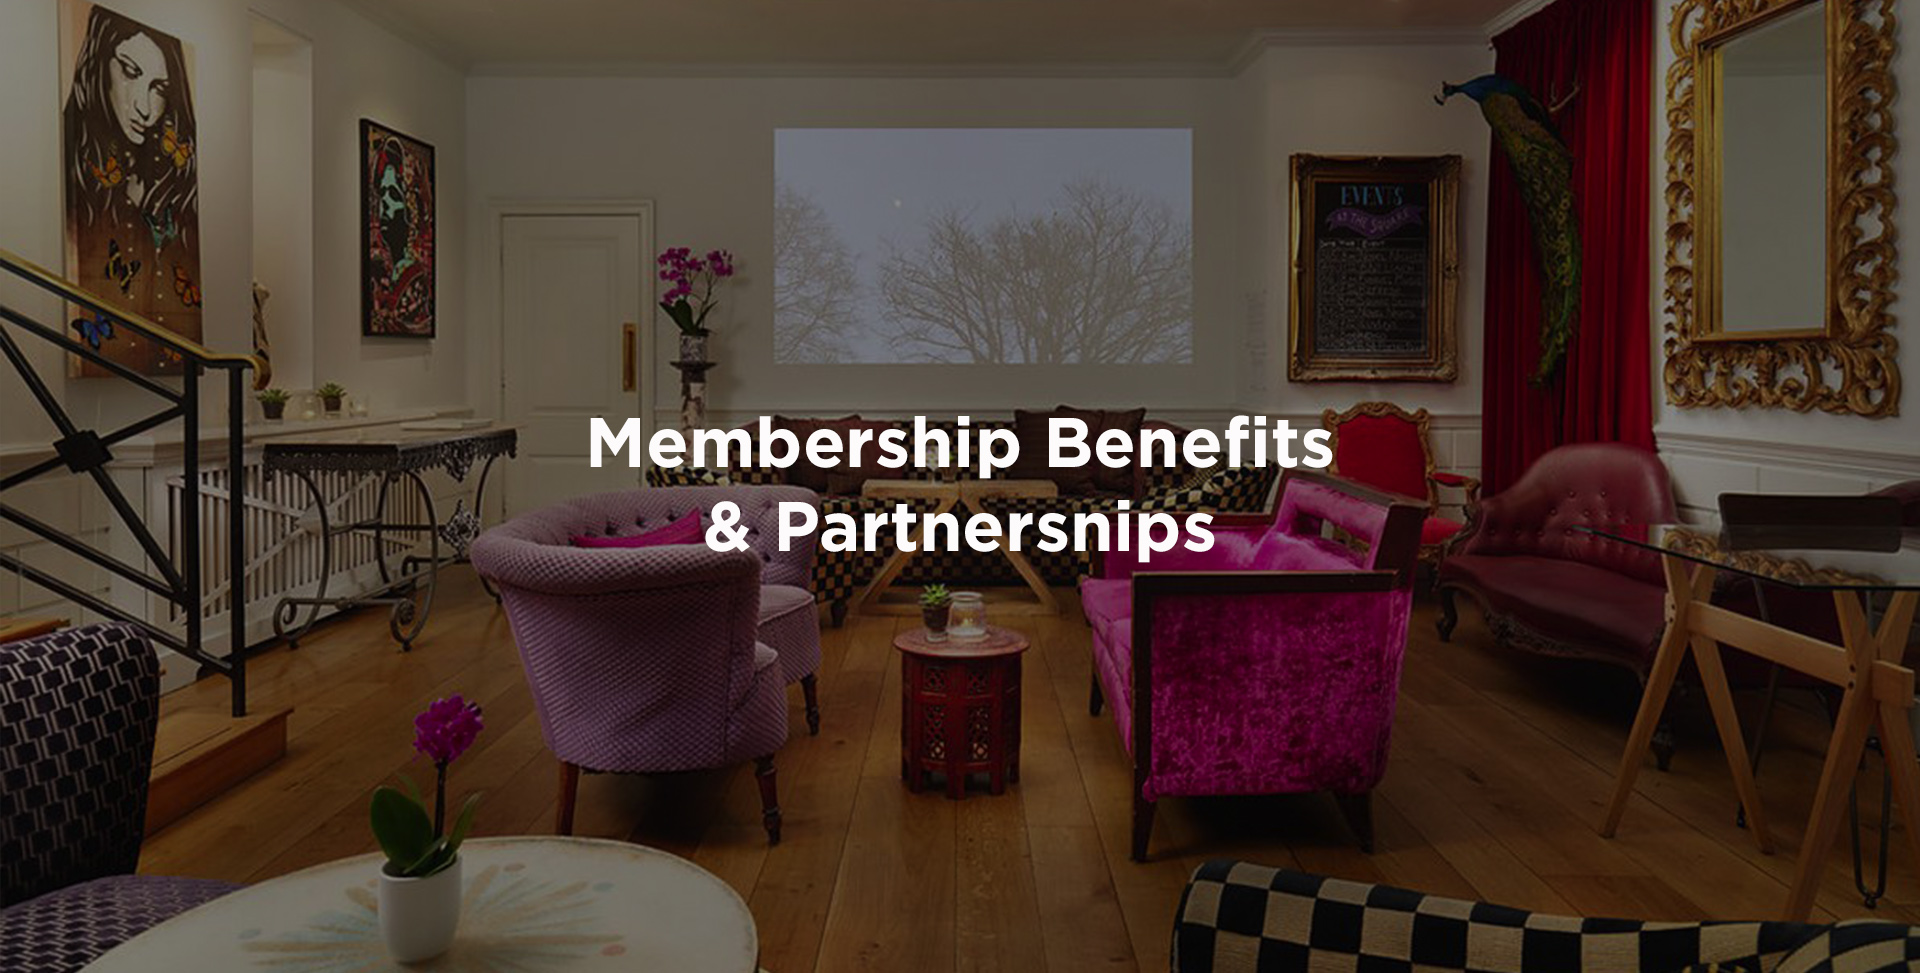 membership-benefits-and-partnerships